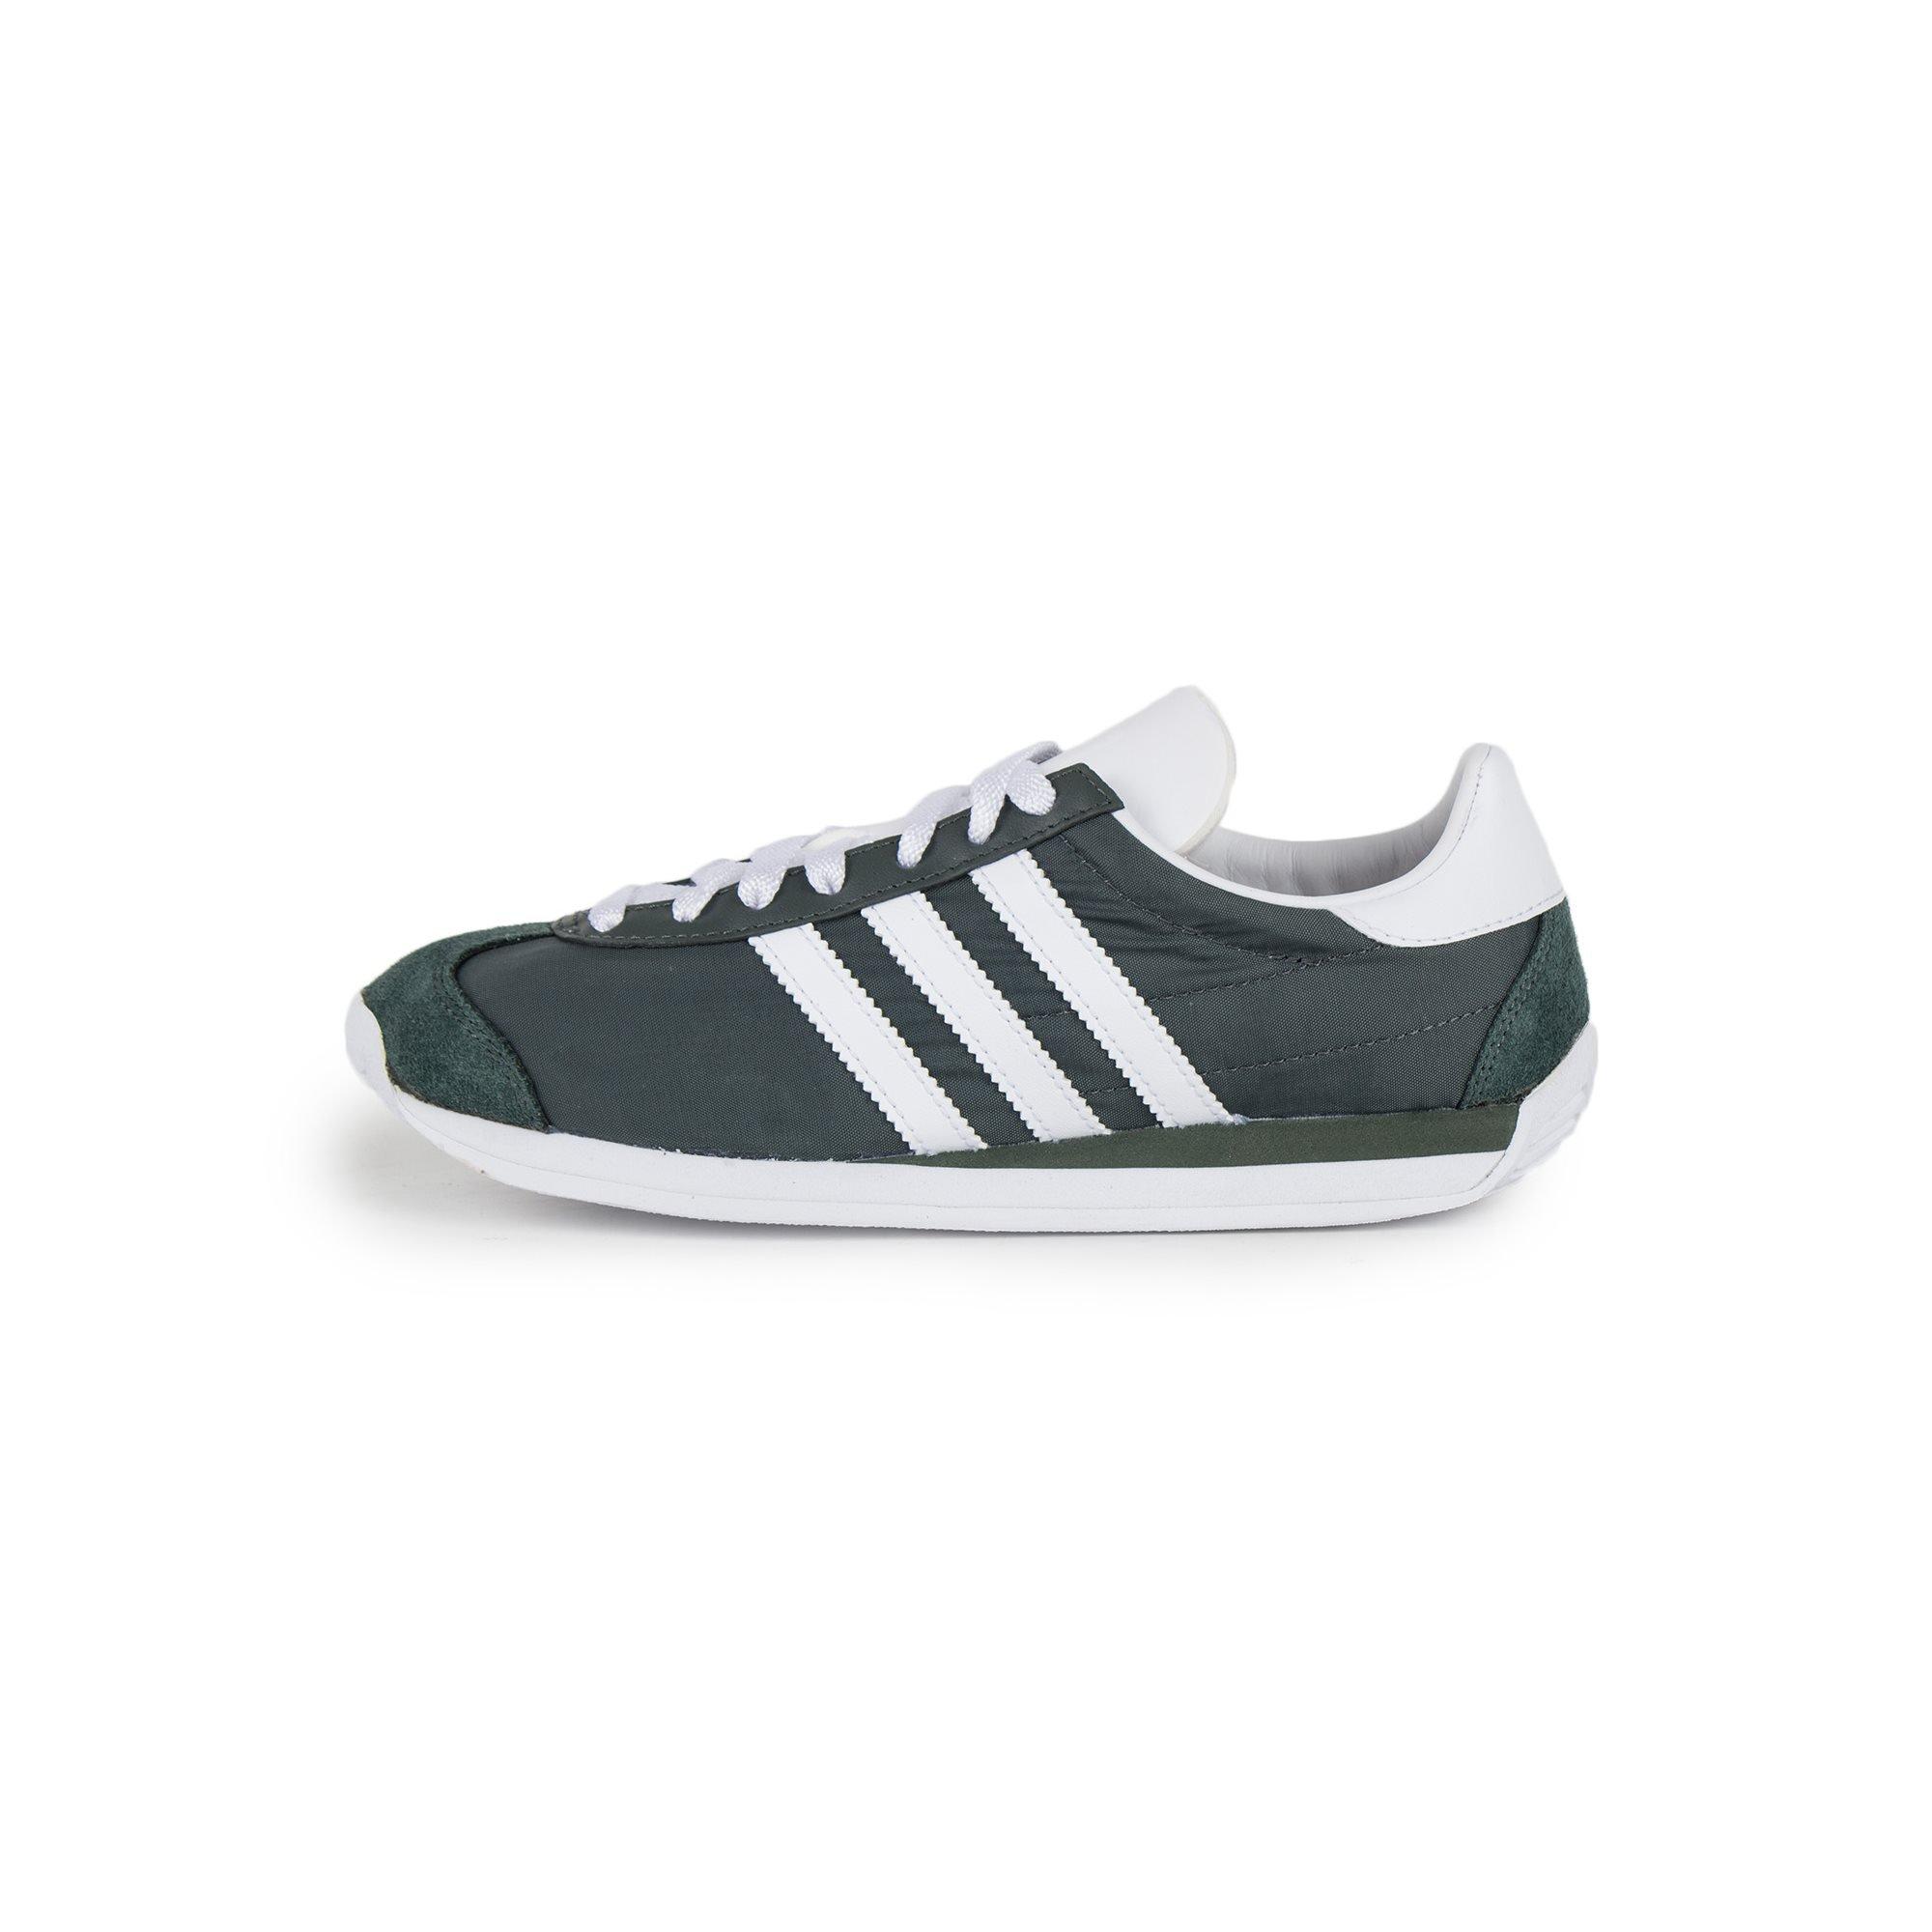 new product 8d69e 735de zapatillas adidas country og,NUEVAS adidas originales pa铆s OG zapatos damas  sneaker zapatillas de deporte ...